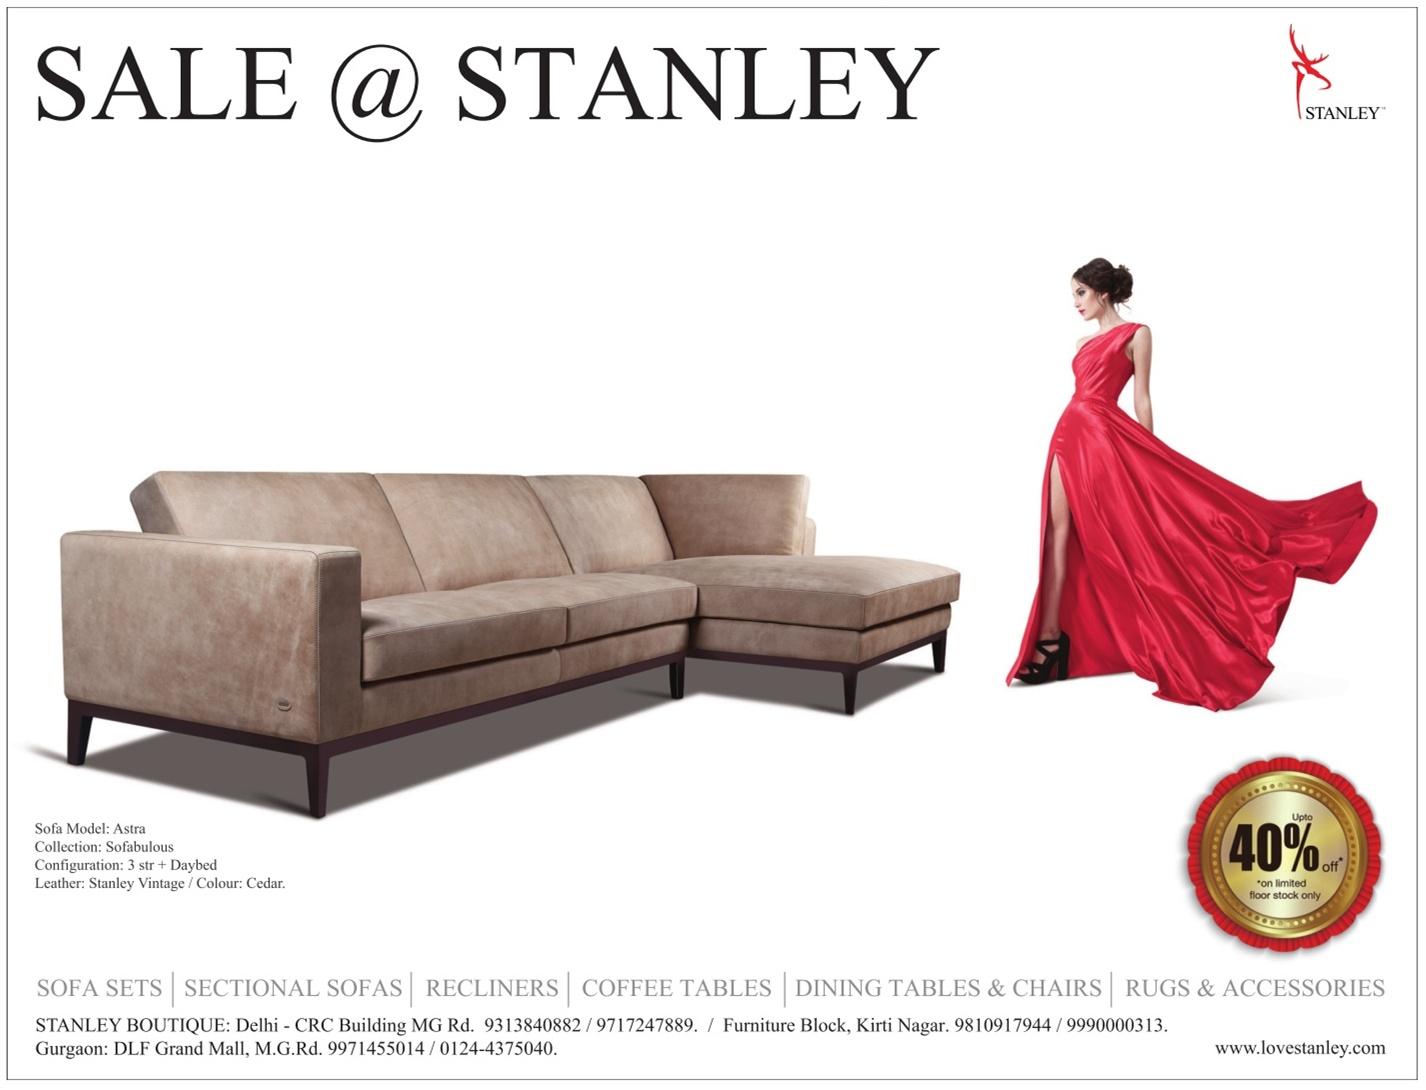 stanley sofa buy cushions sofas upto 40 off mumbai new delhi